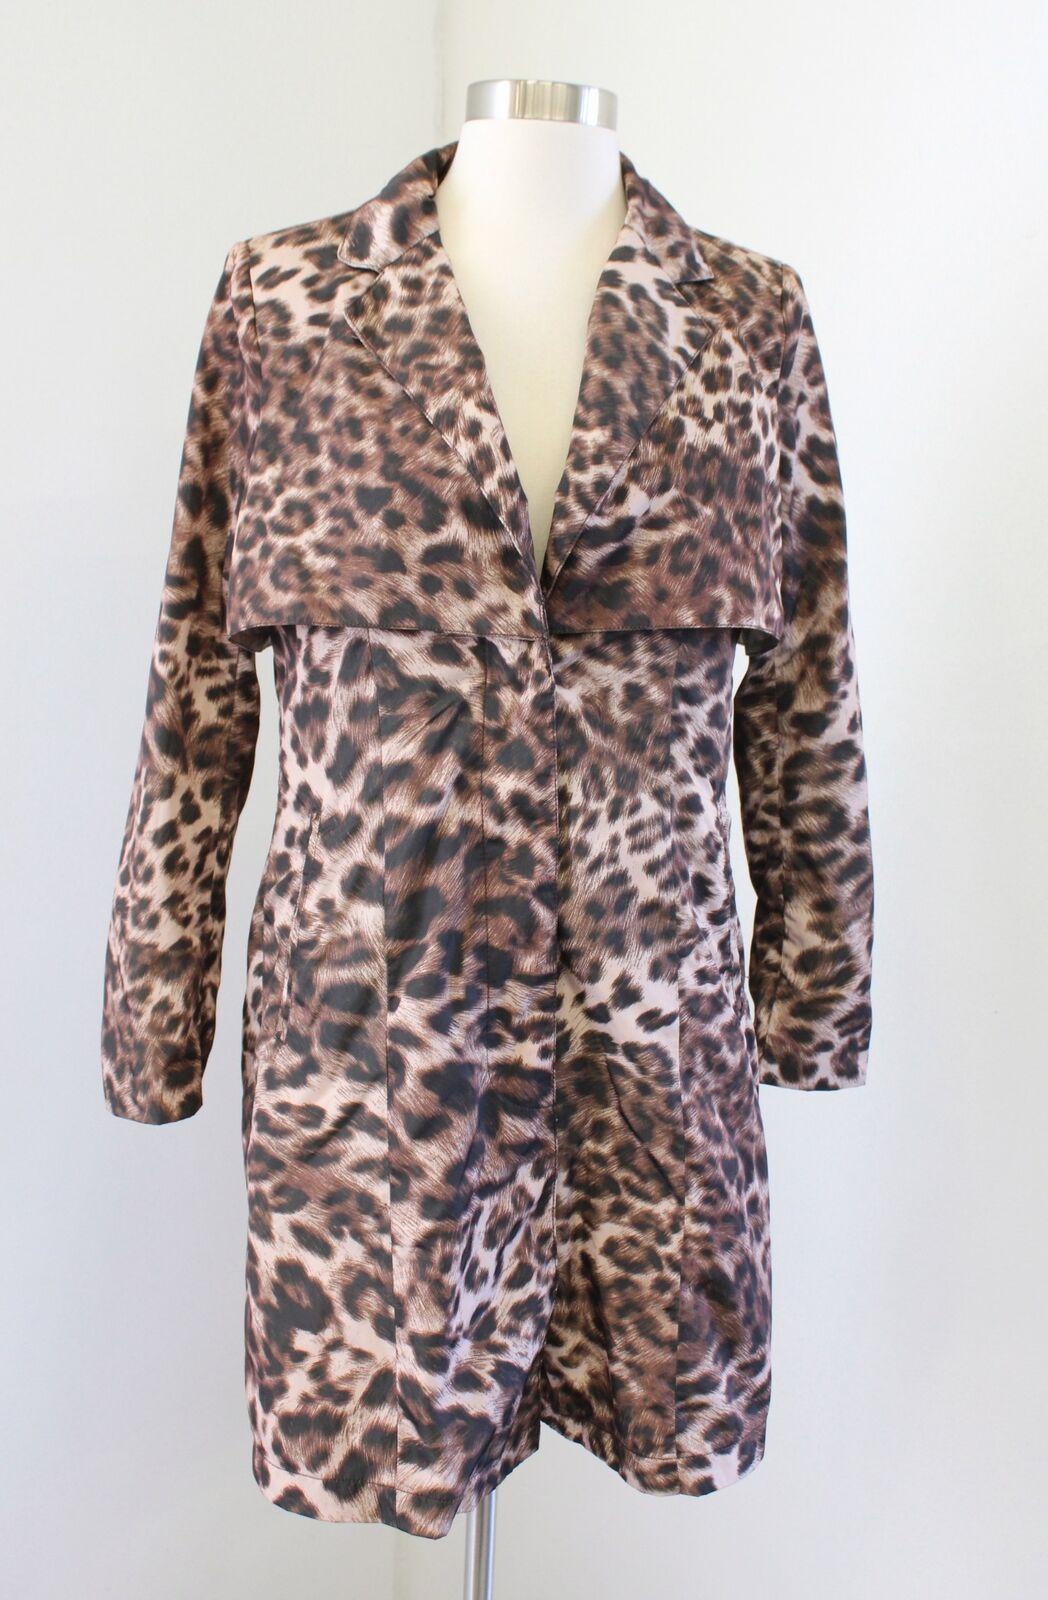 American Glamour Badgley Mischka Leopard Cheetah Print Button Front Jacket Sz XS